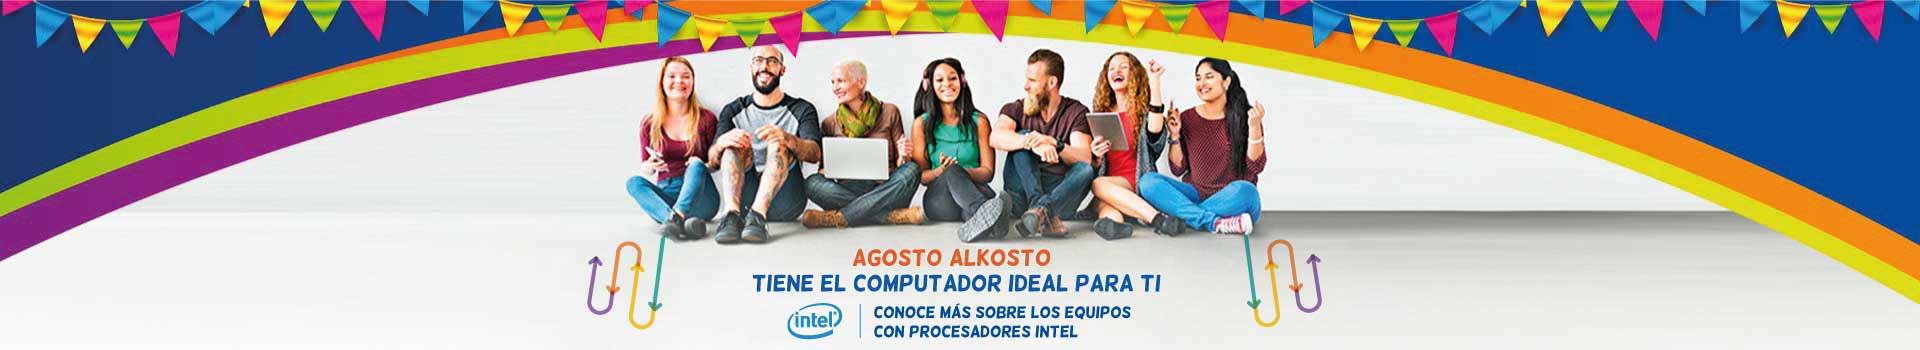 PAUTA - PPAL KT-6-computadores-Campaña Intel-prod-agosto15-31